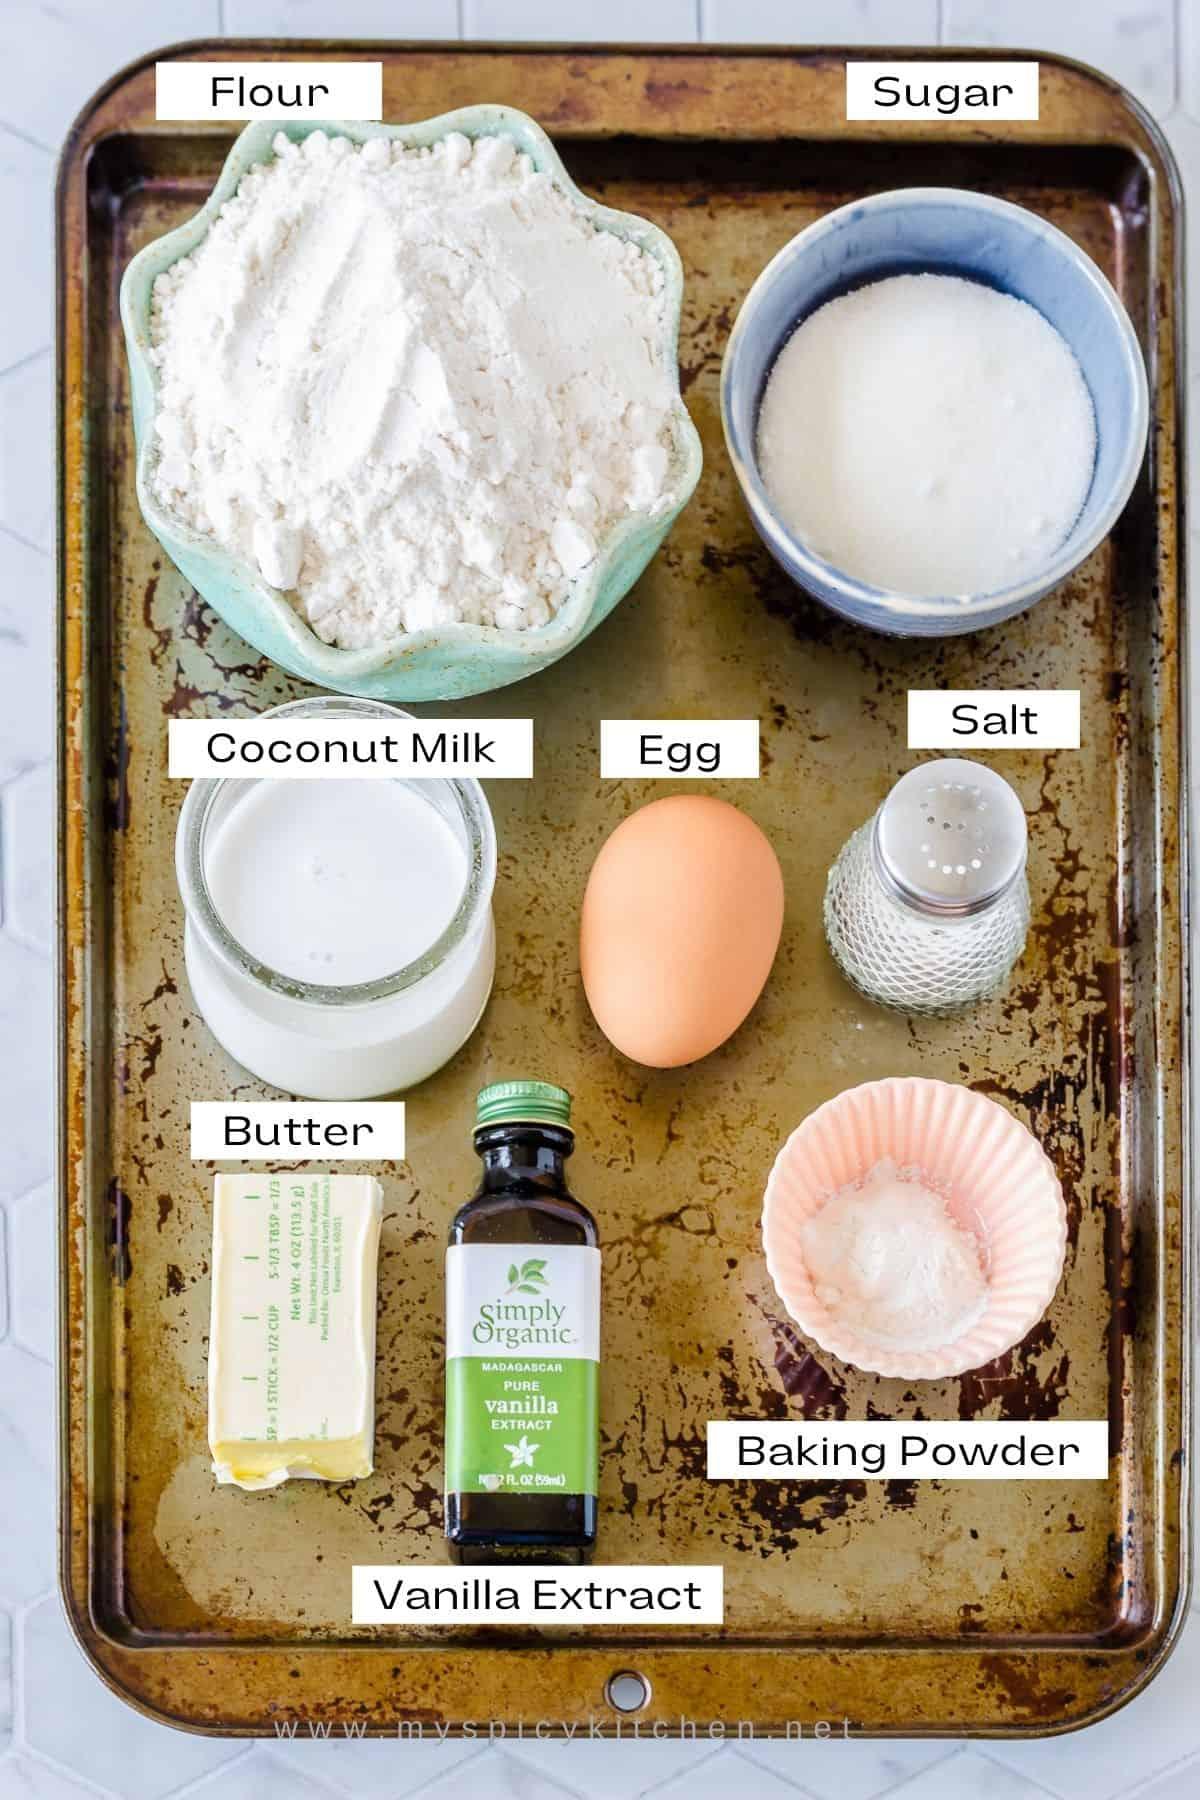 Ingredients for coconut masi samoa - coconut shortbread cookies.